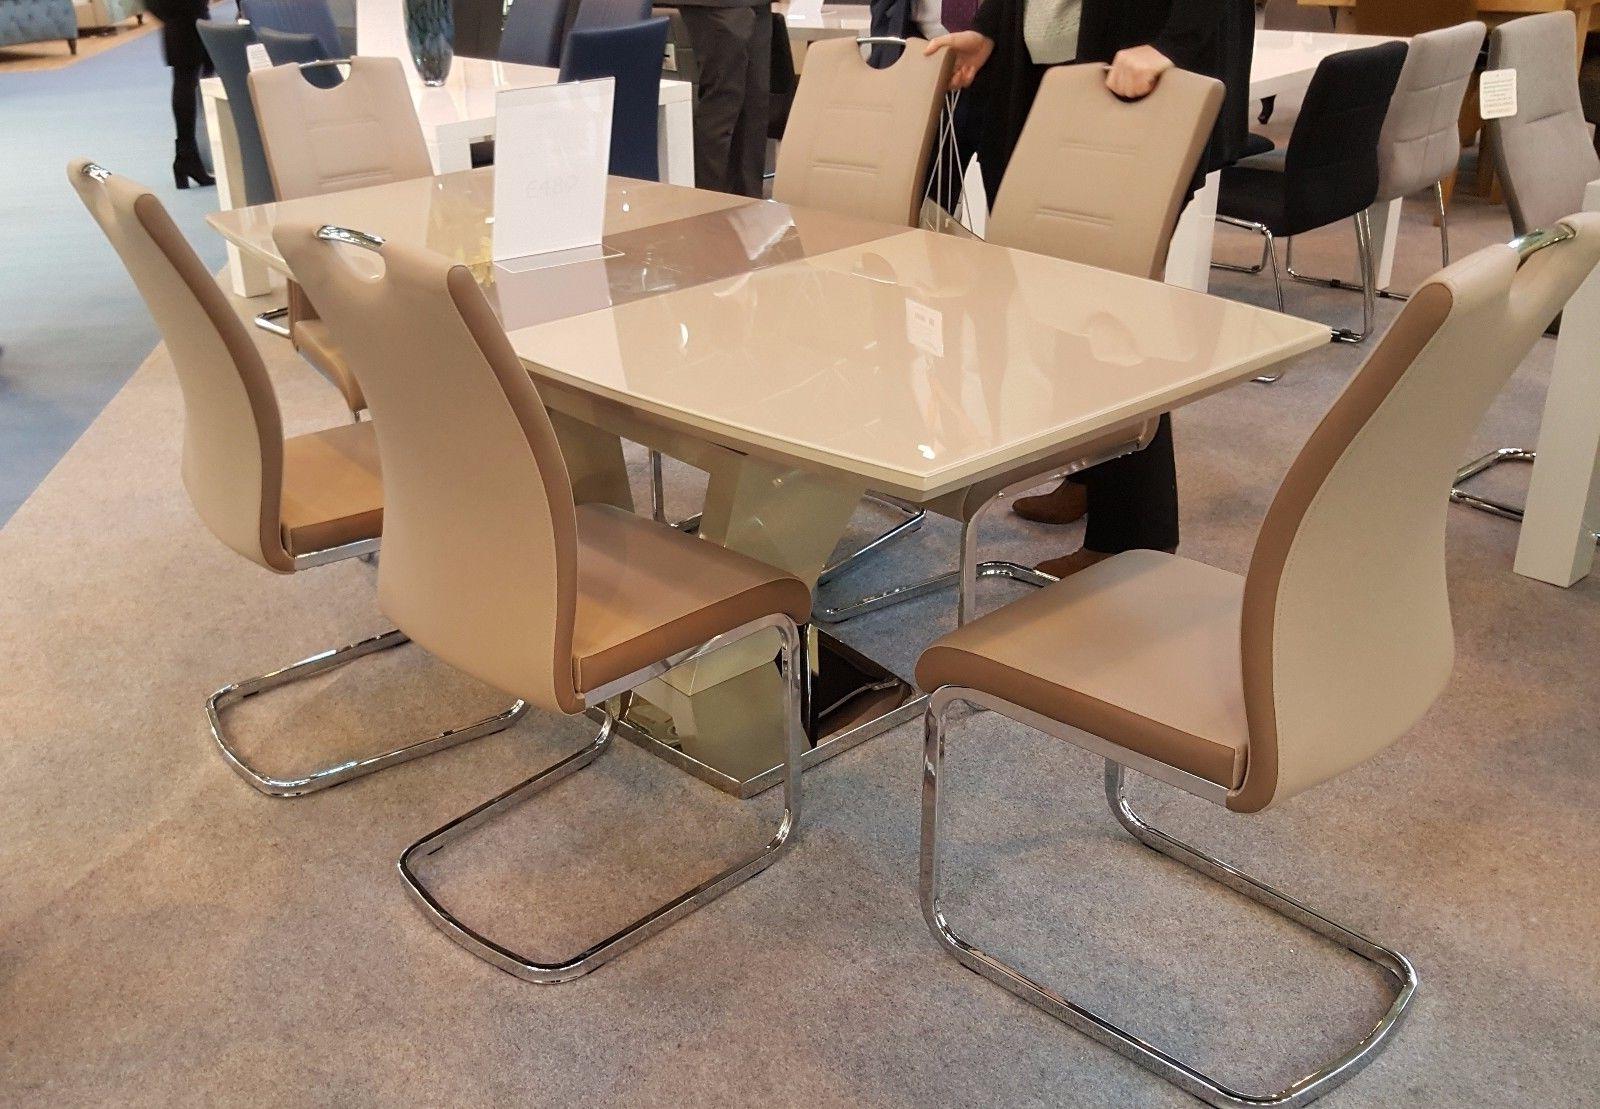 New Aspen Cream/latte High Gloss/glass 160 200Cm Ext Dining Table + With Newest High Gloss Cream Dining Tables (Gallery 17 of 25)